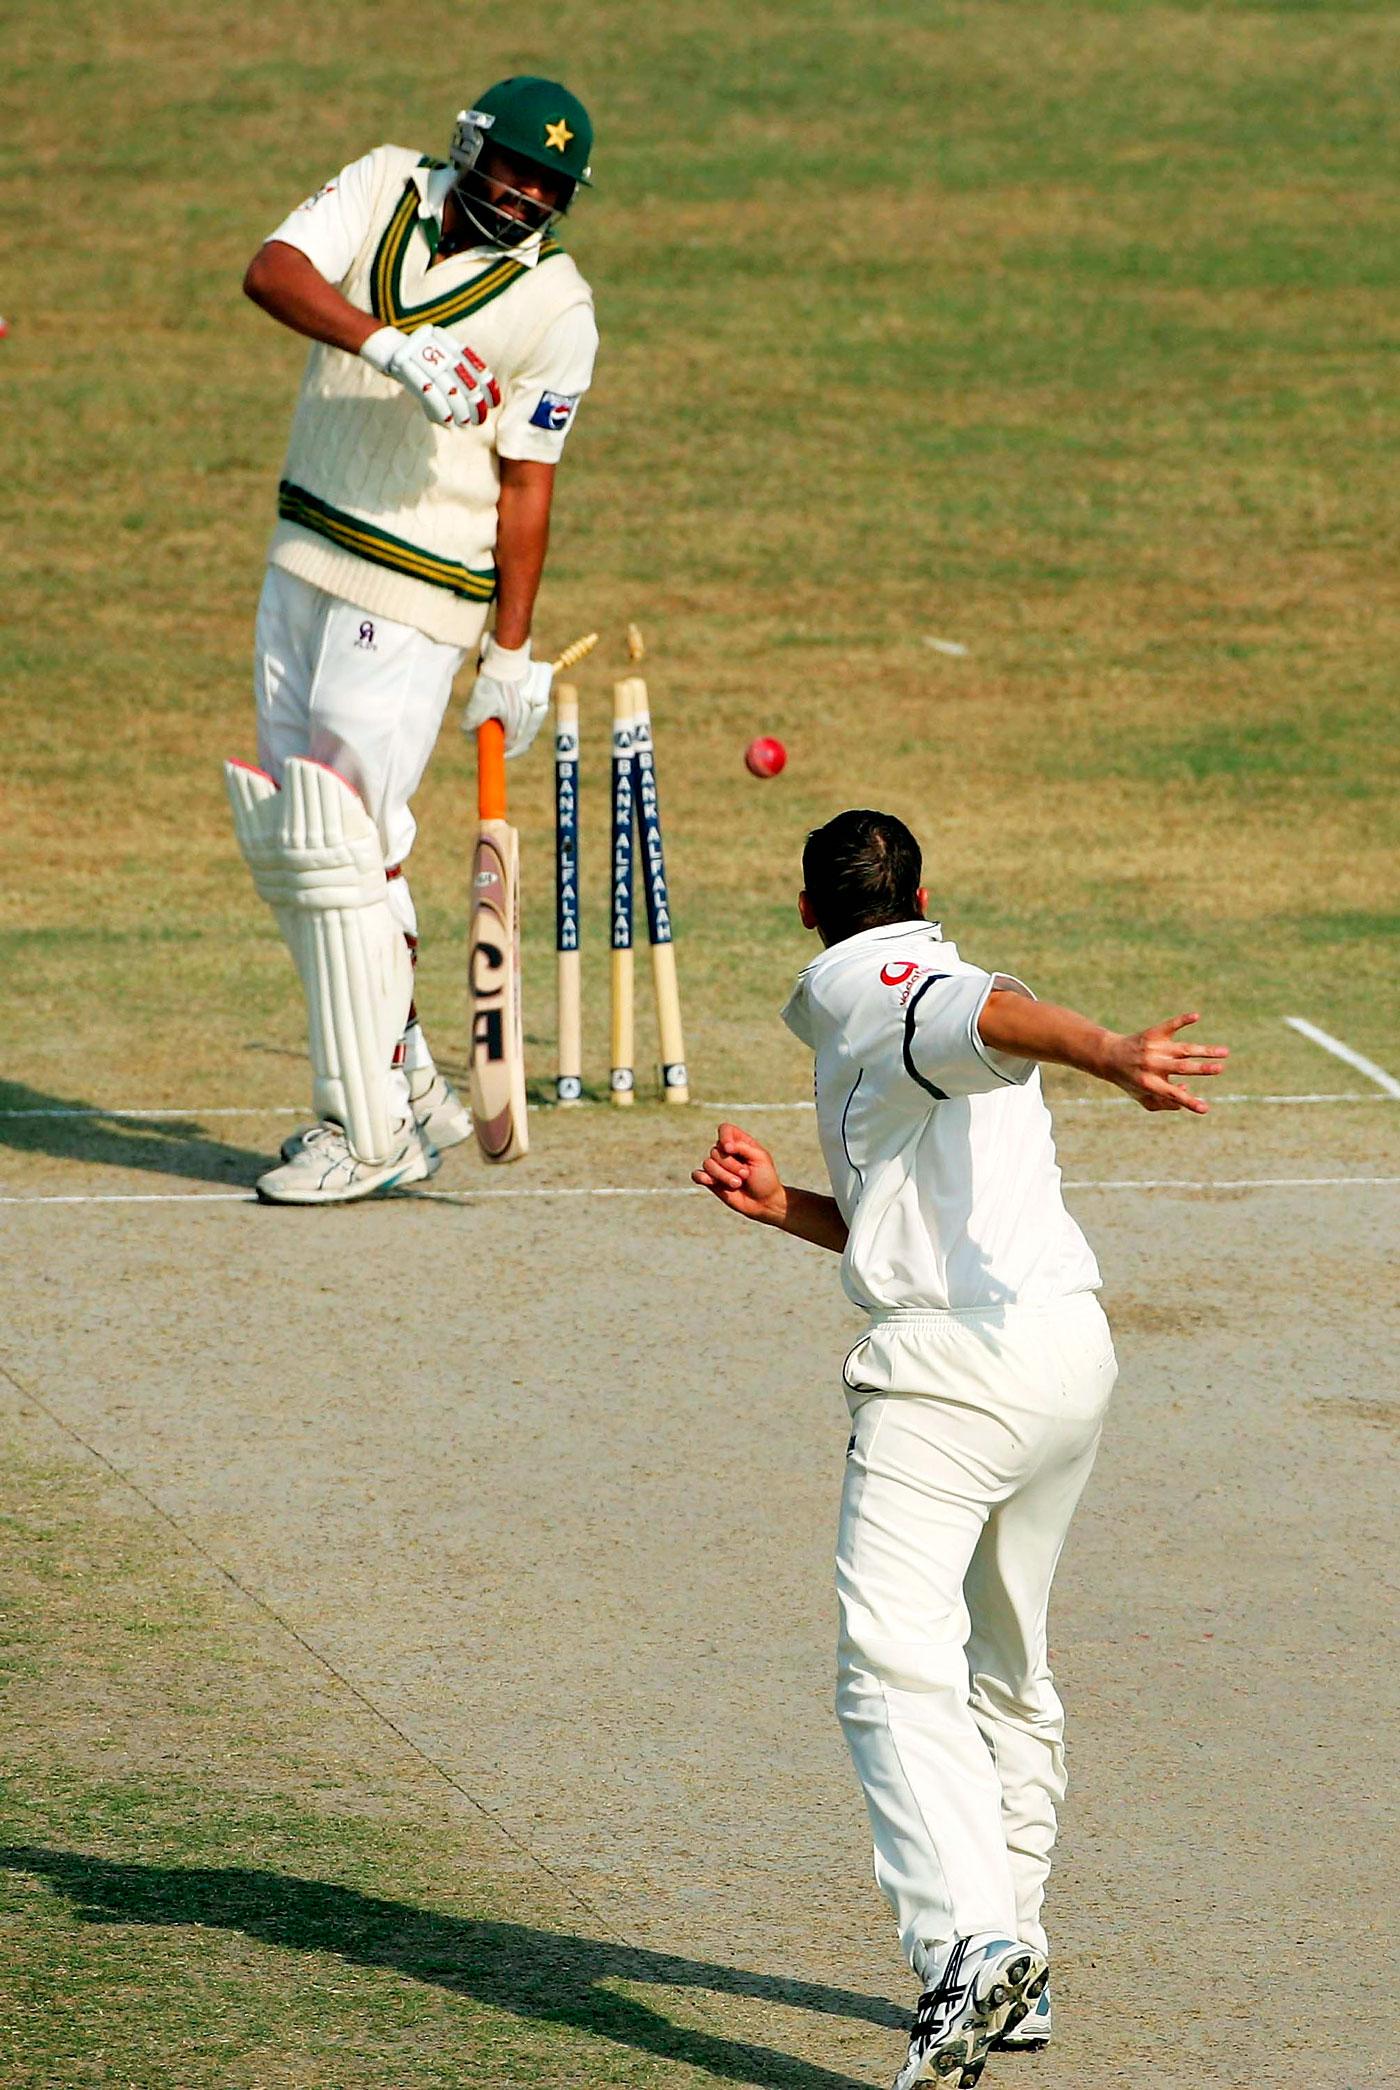 Hips don't lie: Steve Harmison's throw finds Inzamam in an unnaturally frisky posture, Faisalabad 2005